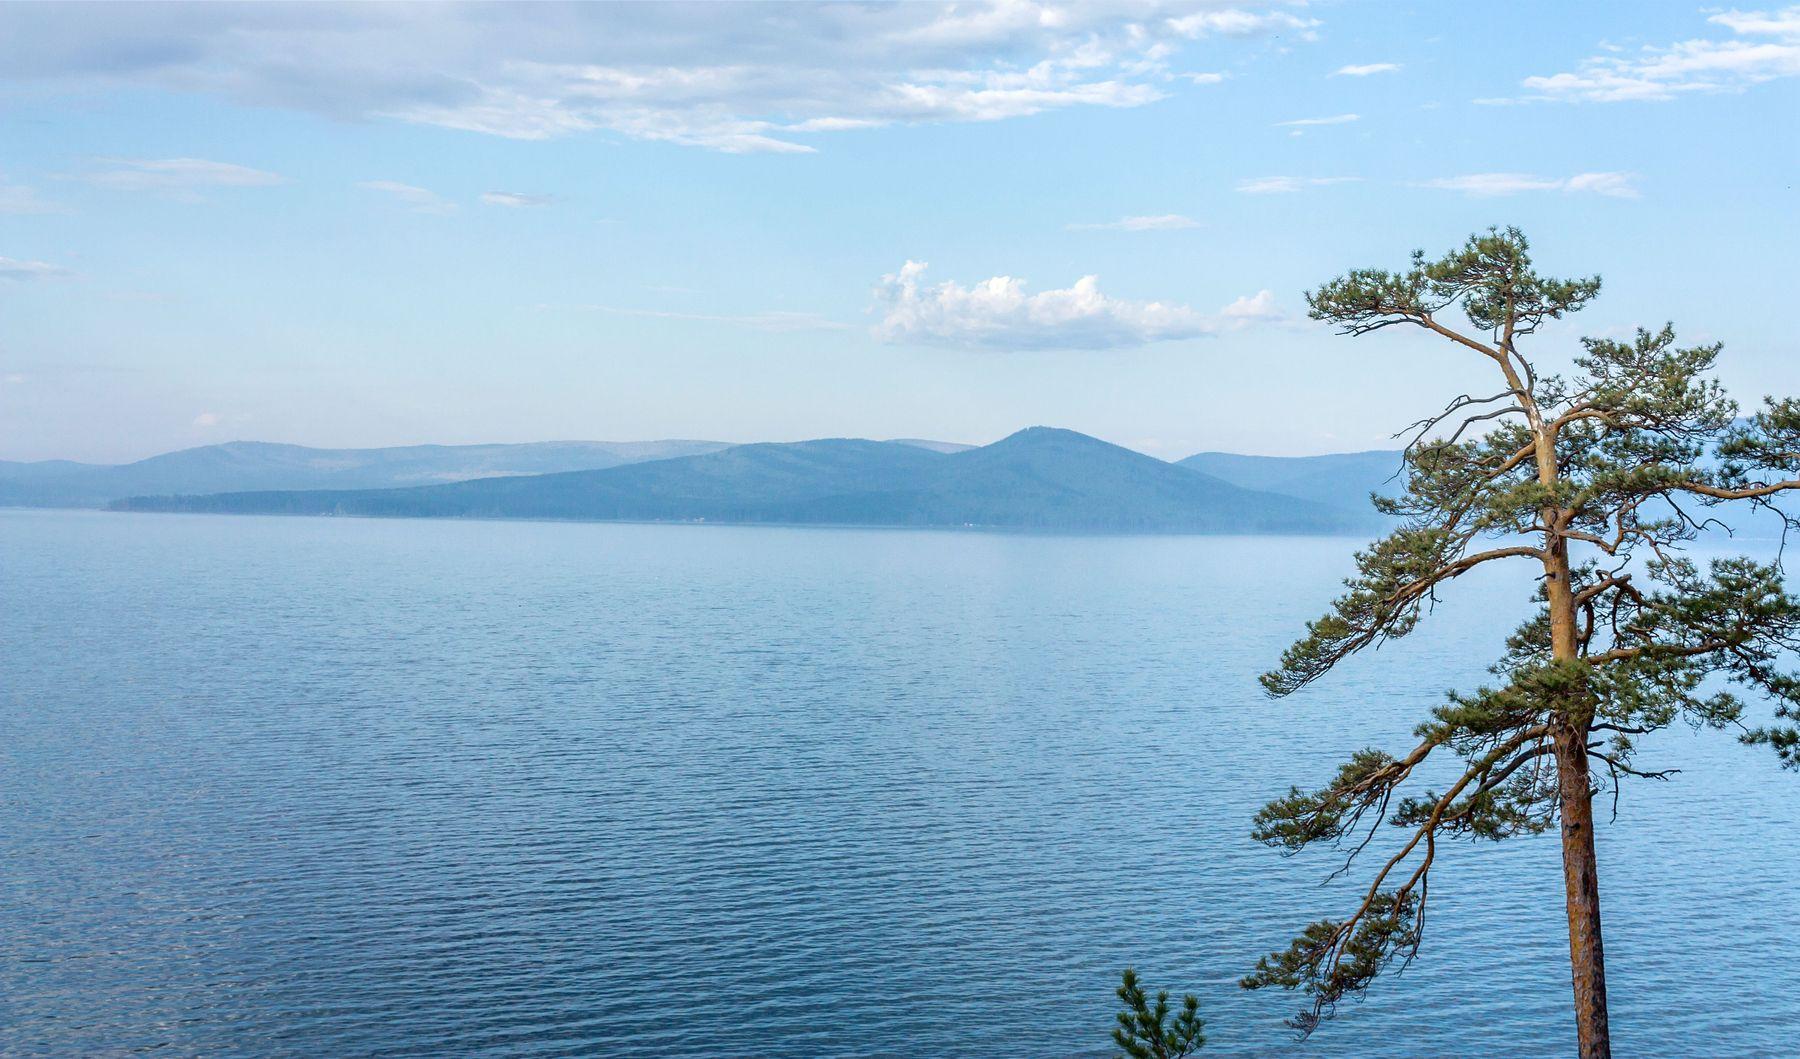 Озеро Тургояк Южный Урал Миасс Тургояк